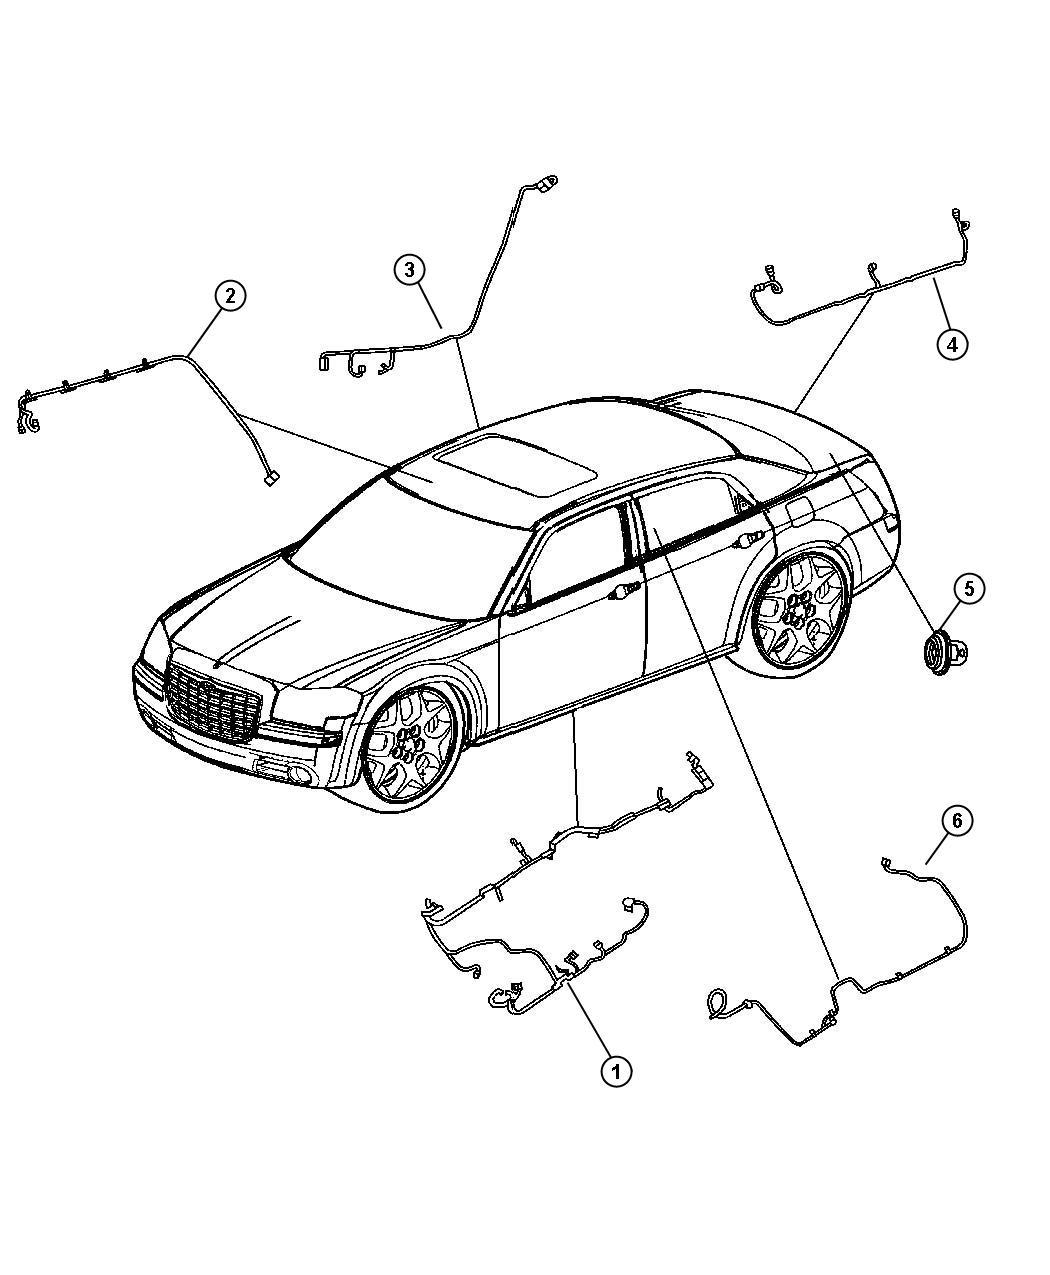 Chrysler 300 Wiring Body Entertainment Systems Sirius